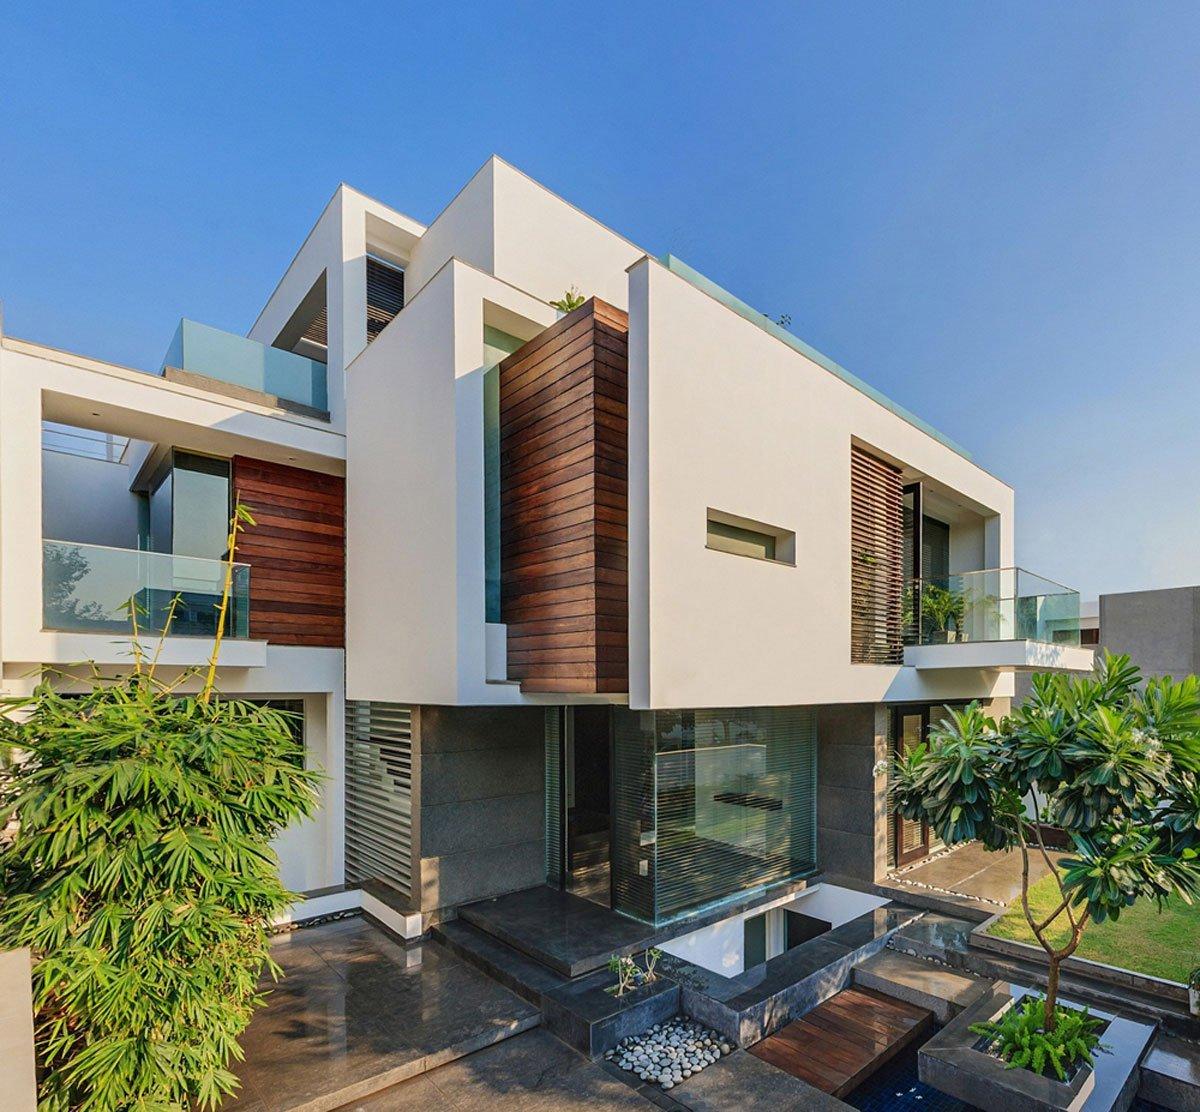 Overhang-House-01